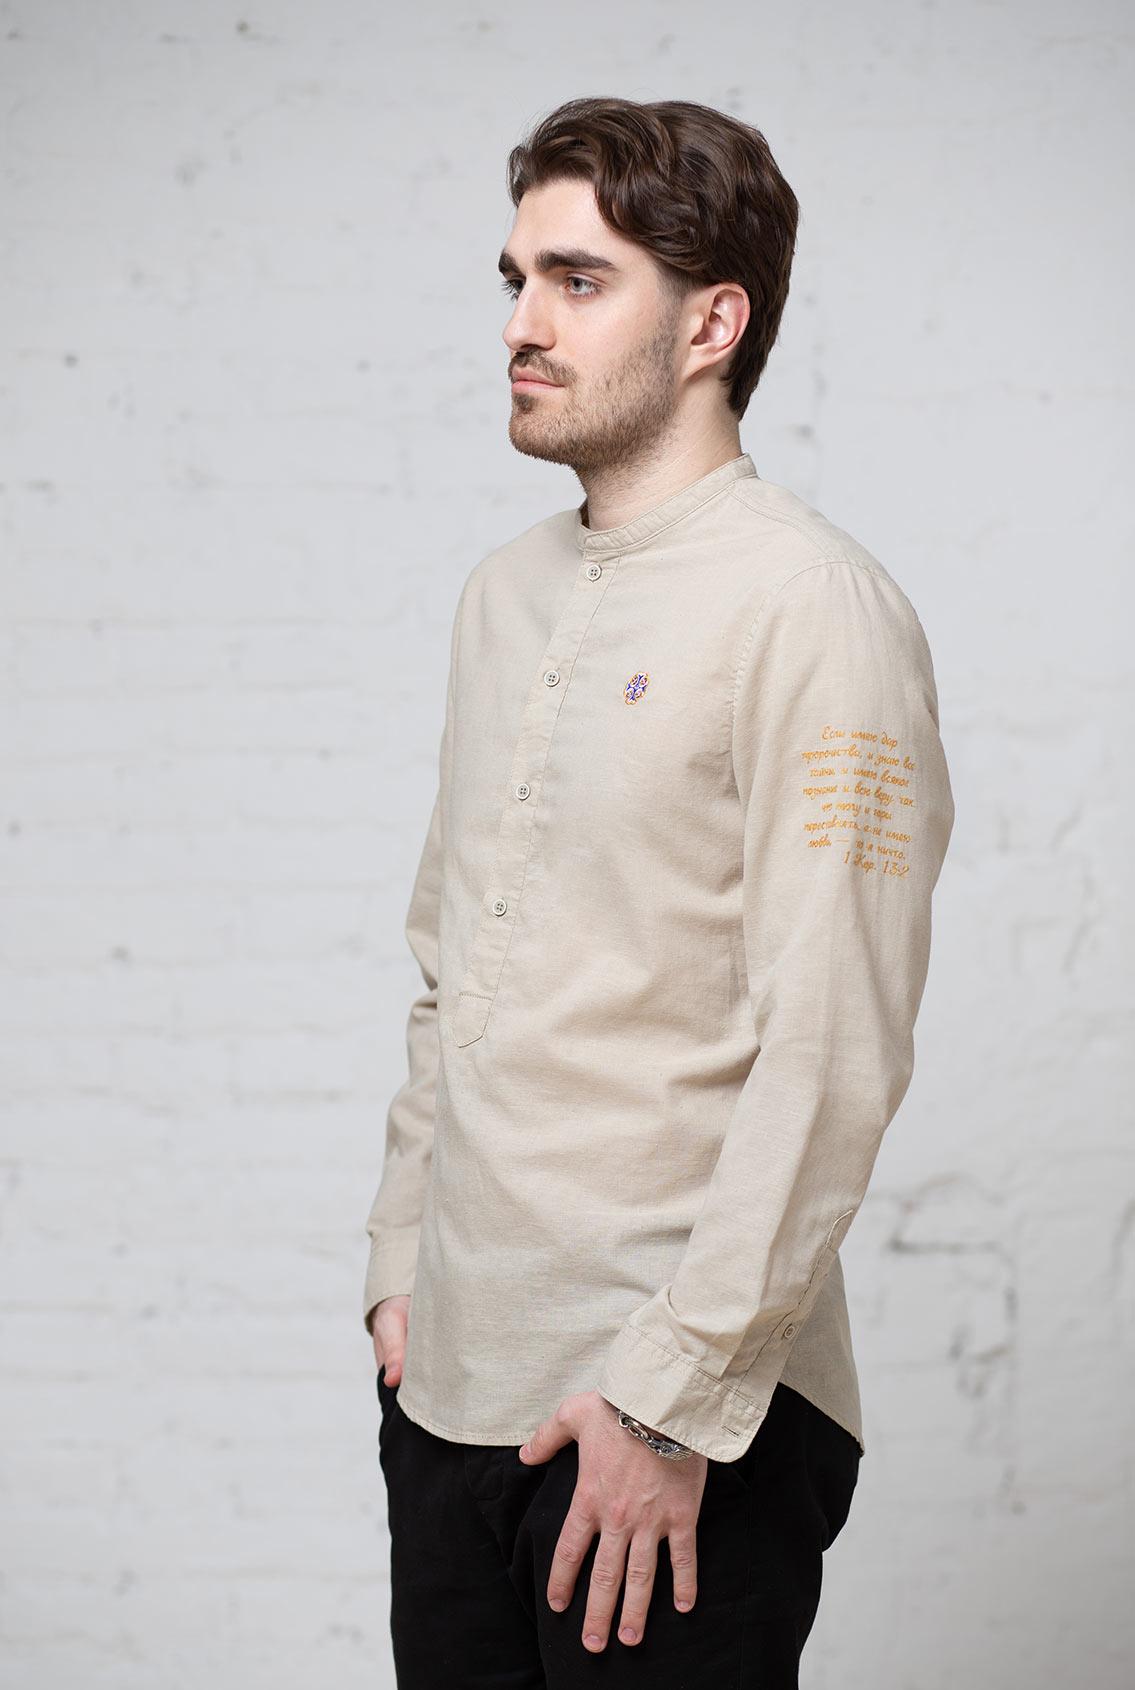 авторская одежда, author's clothes